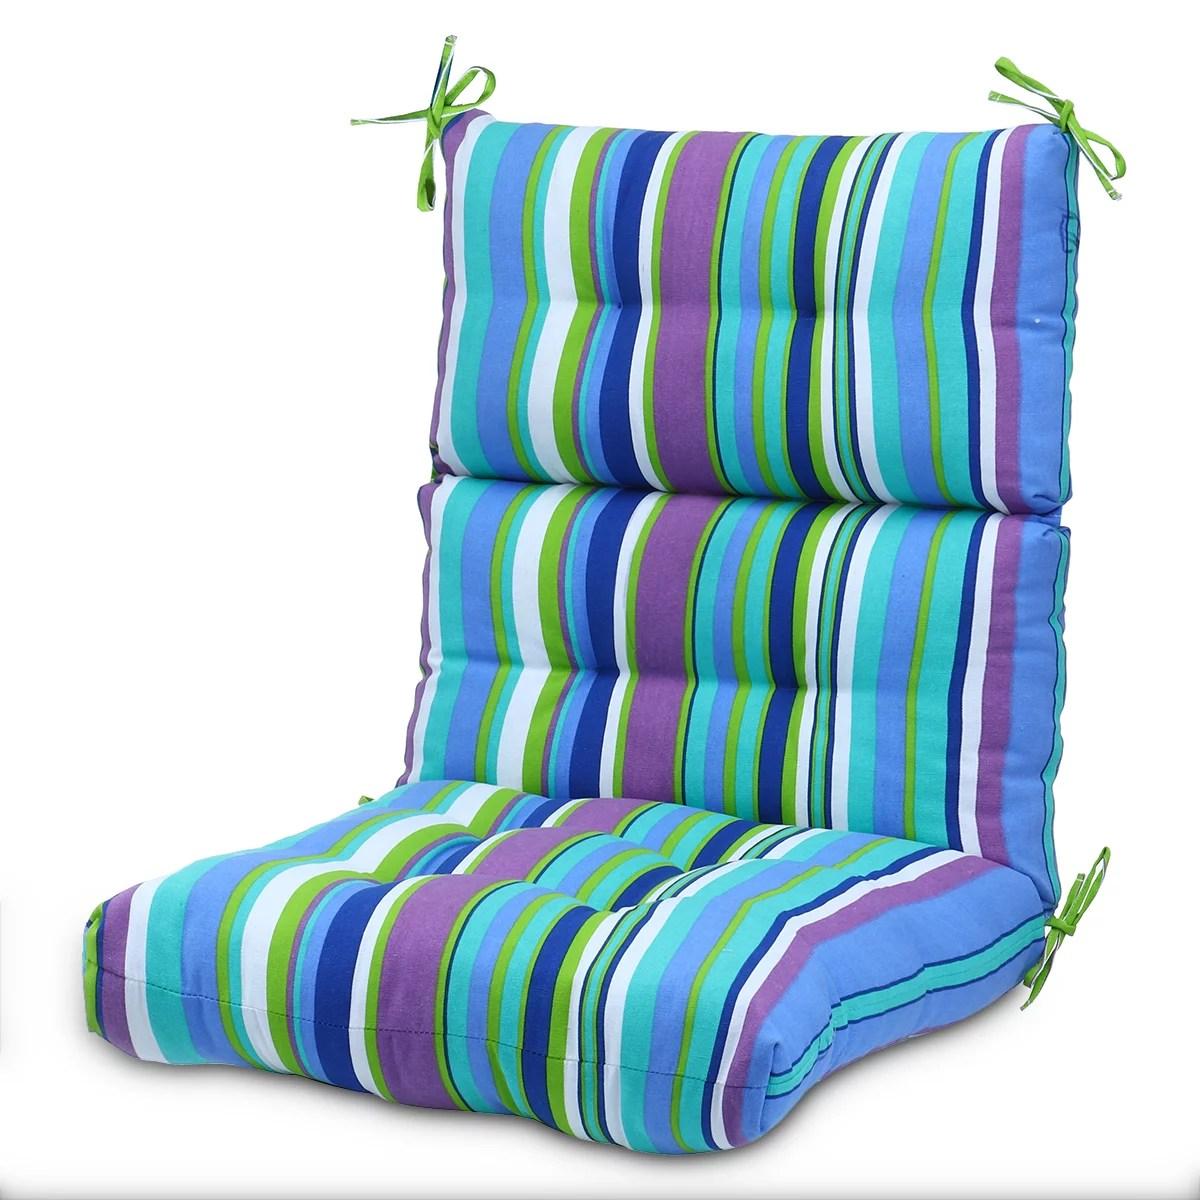 romhouse 44x21 inch solid polyester chair cushion outdoor high back high rebound foam rocking chair cushions patio garden decor multi pattern